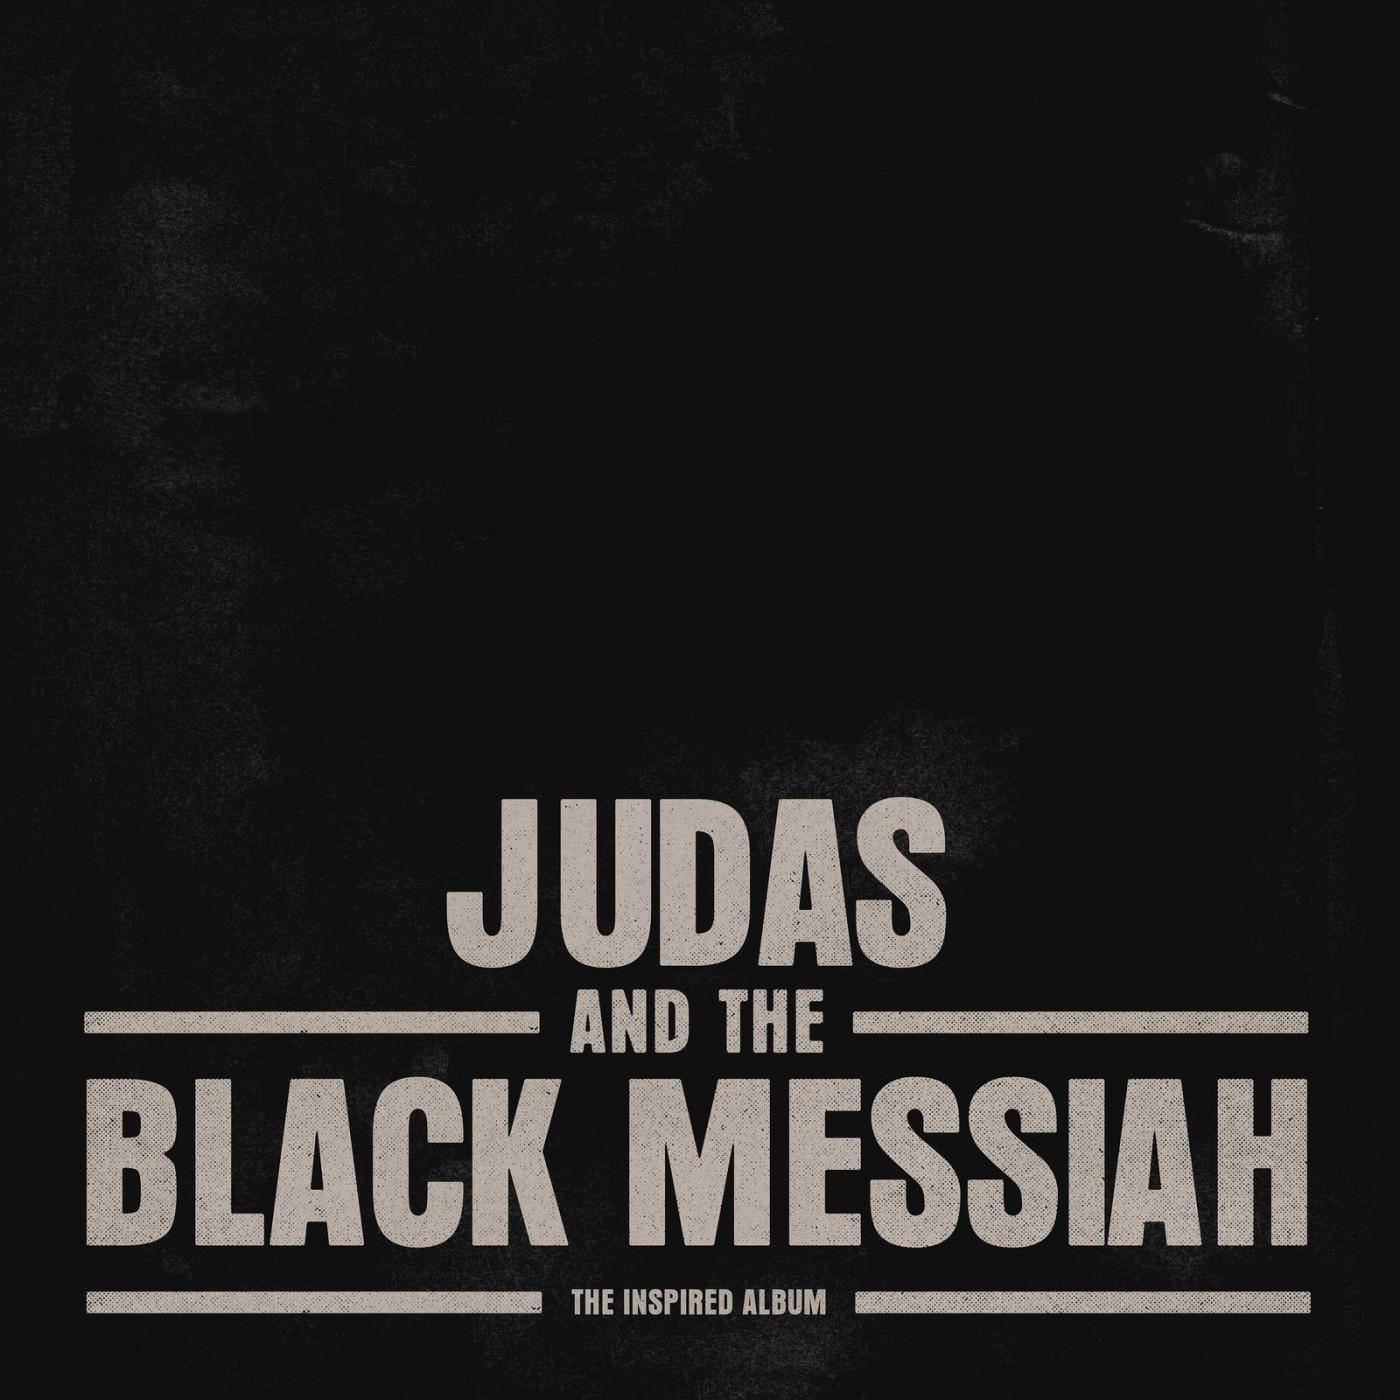 Judas and the Black Messiah soundtrack